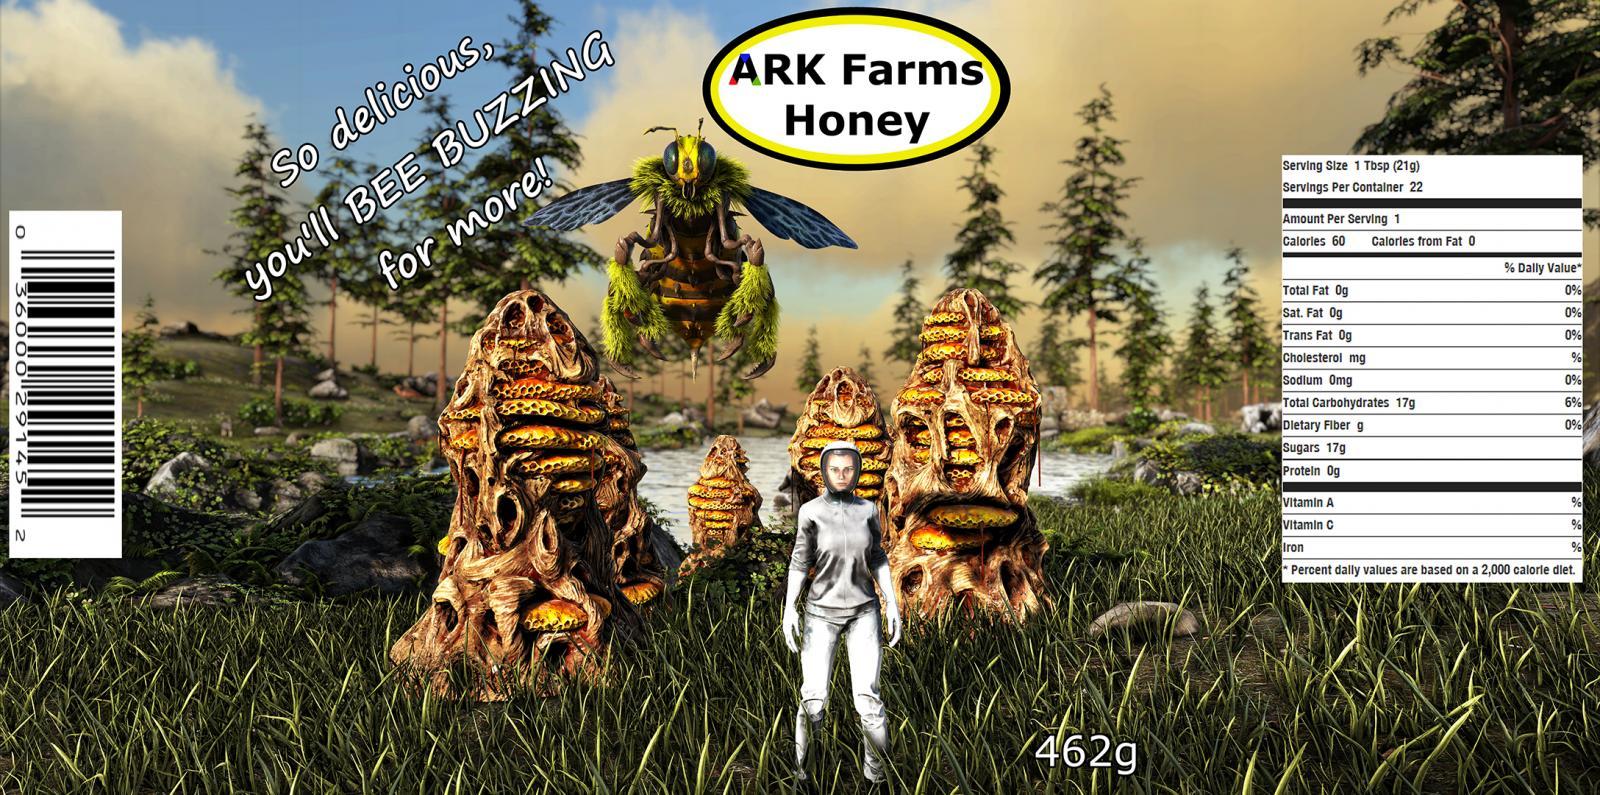 large.5a9d843207878_WolfAmaterasu-ARKFarmsHoneyJarLabel-Freeform.jpg